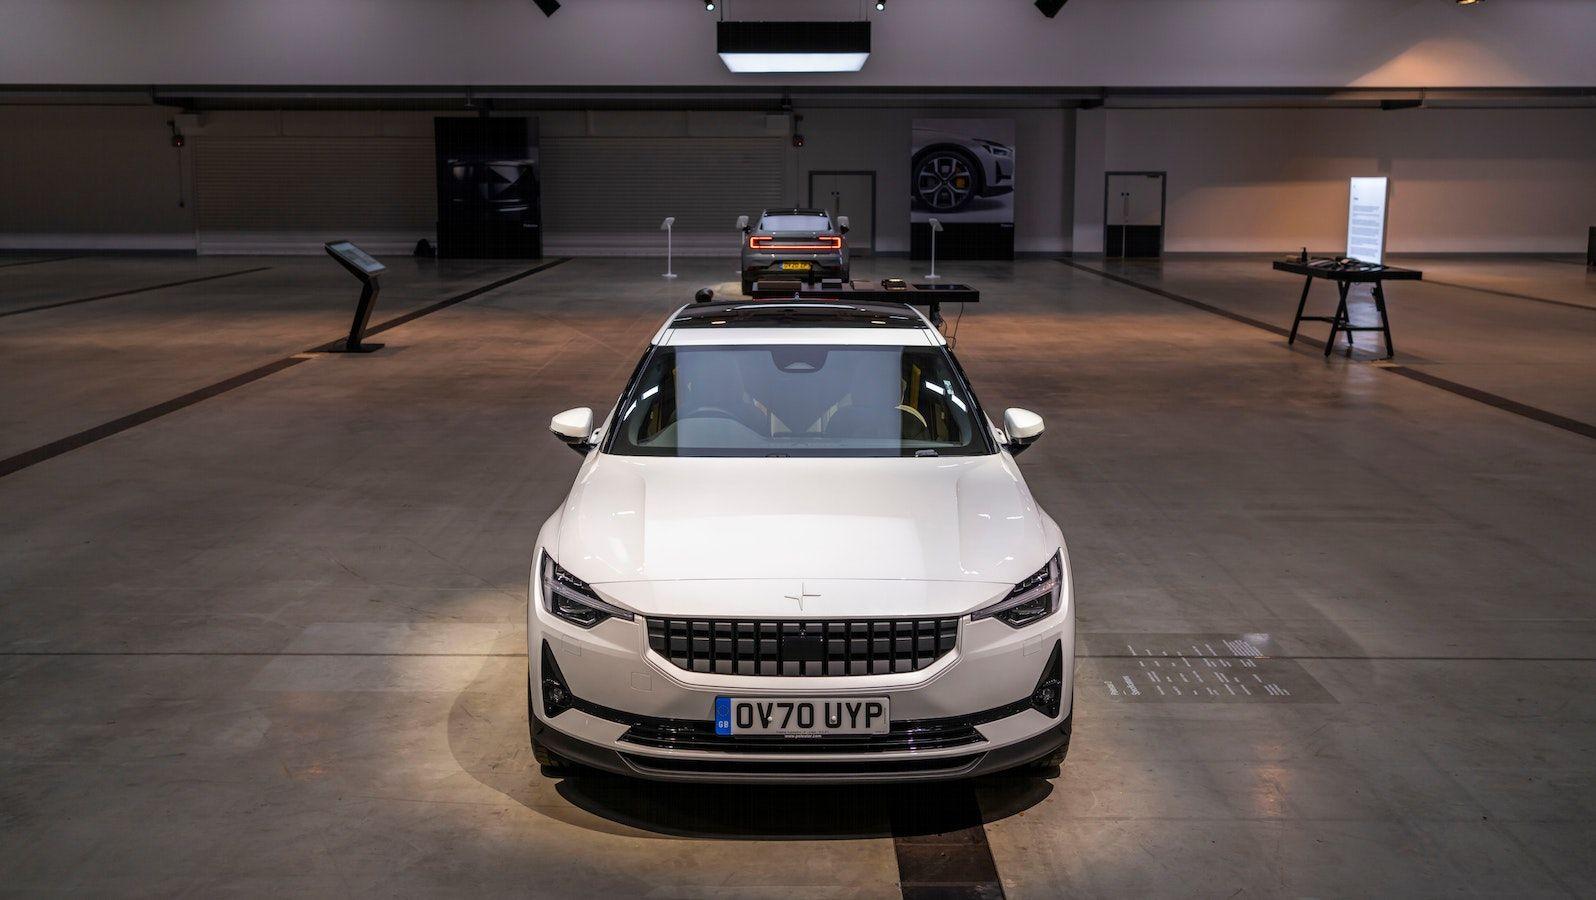 Polestar sponsors a fully electric drive-in cinema.